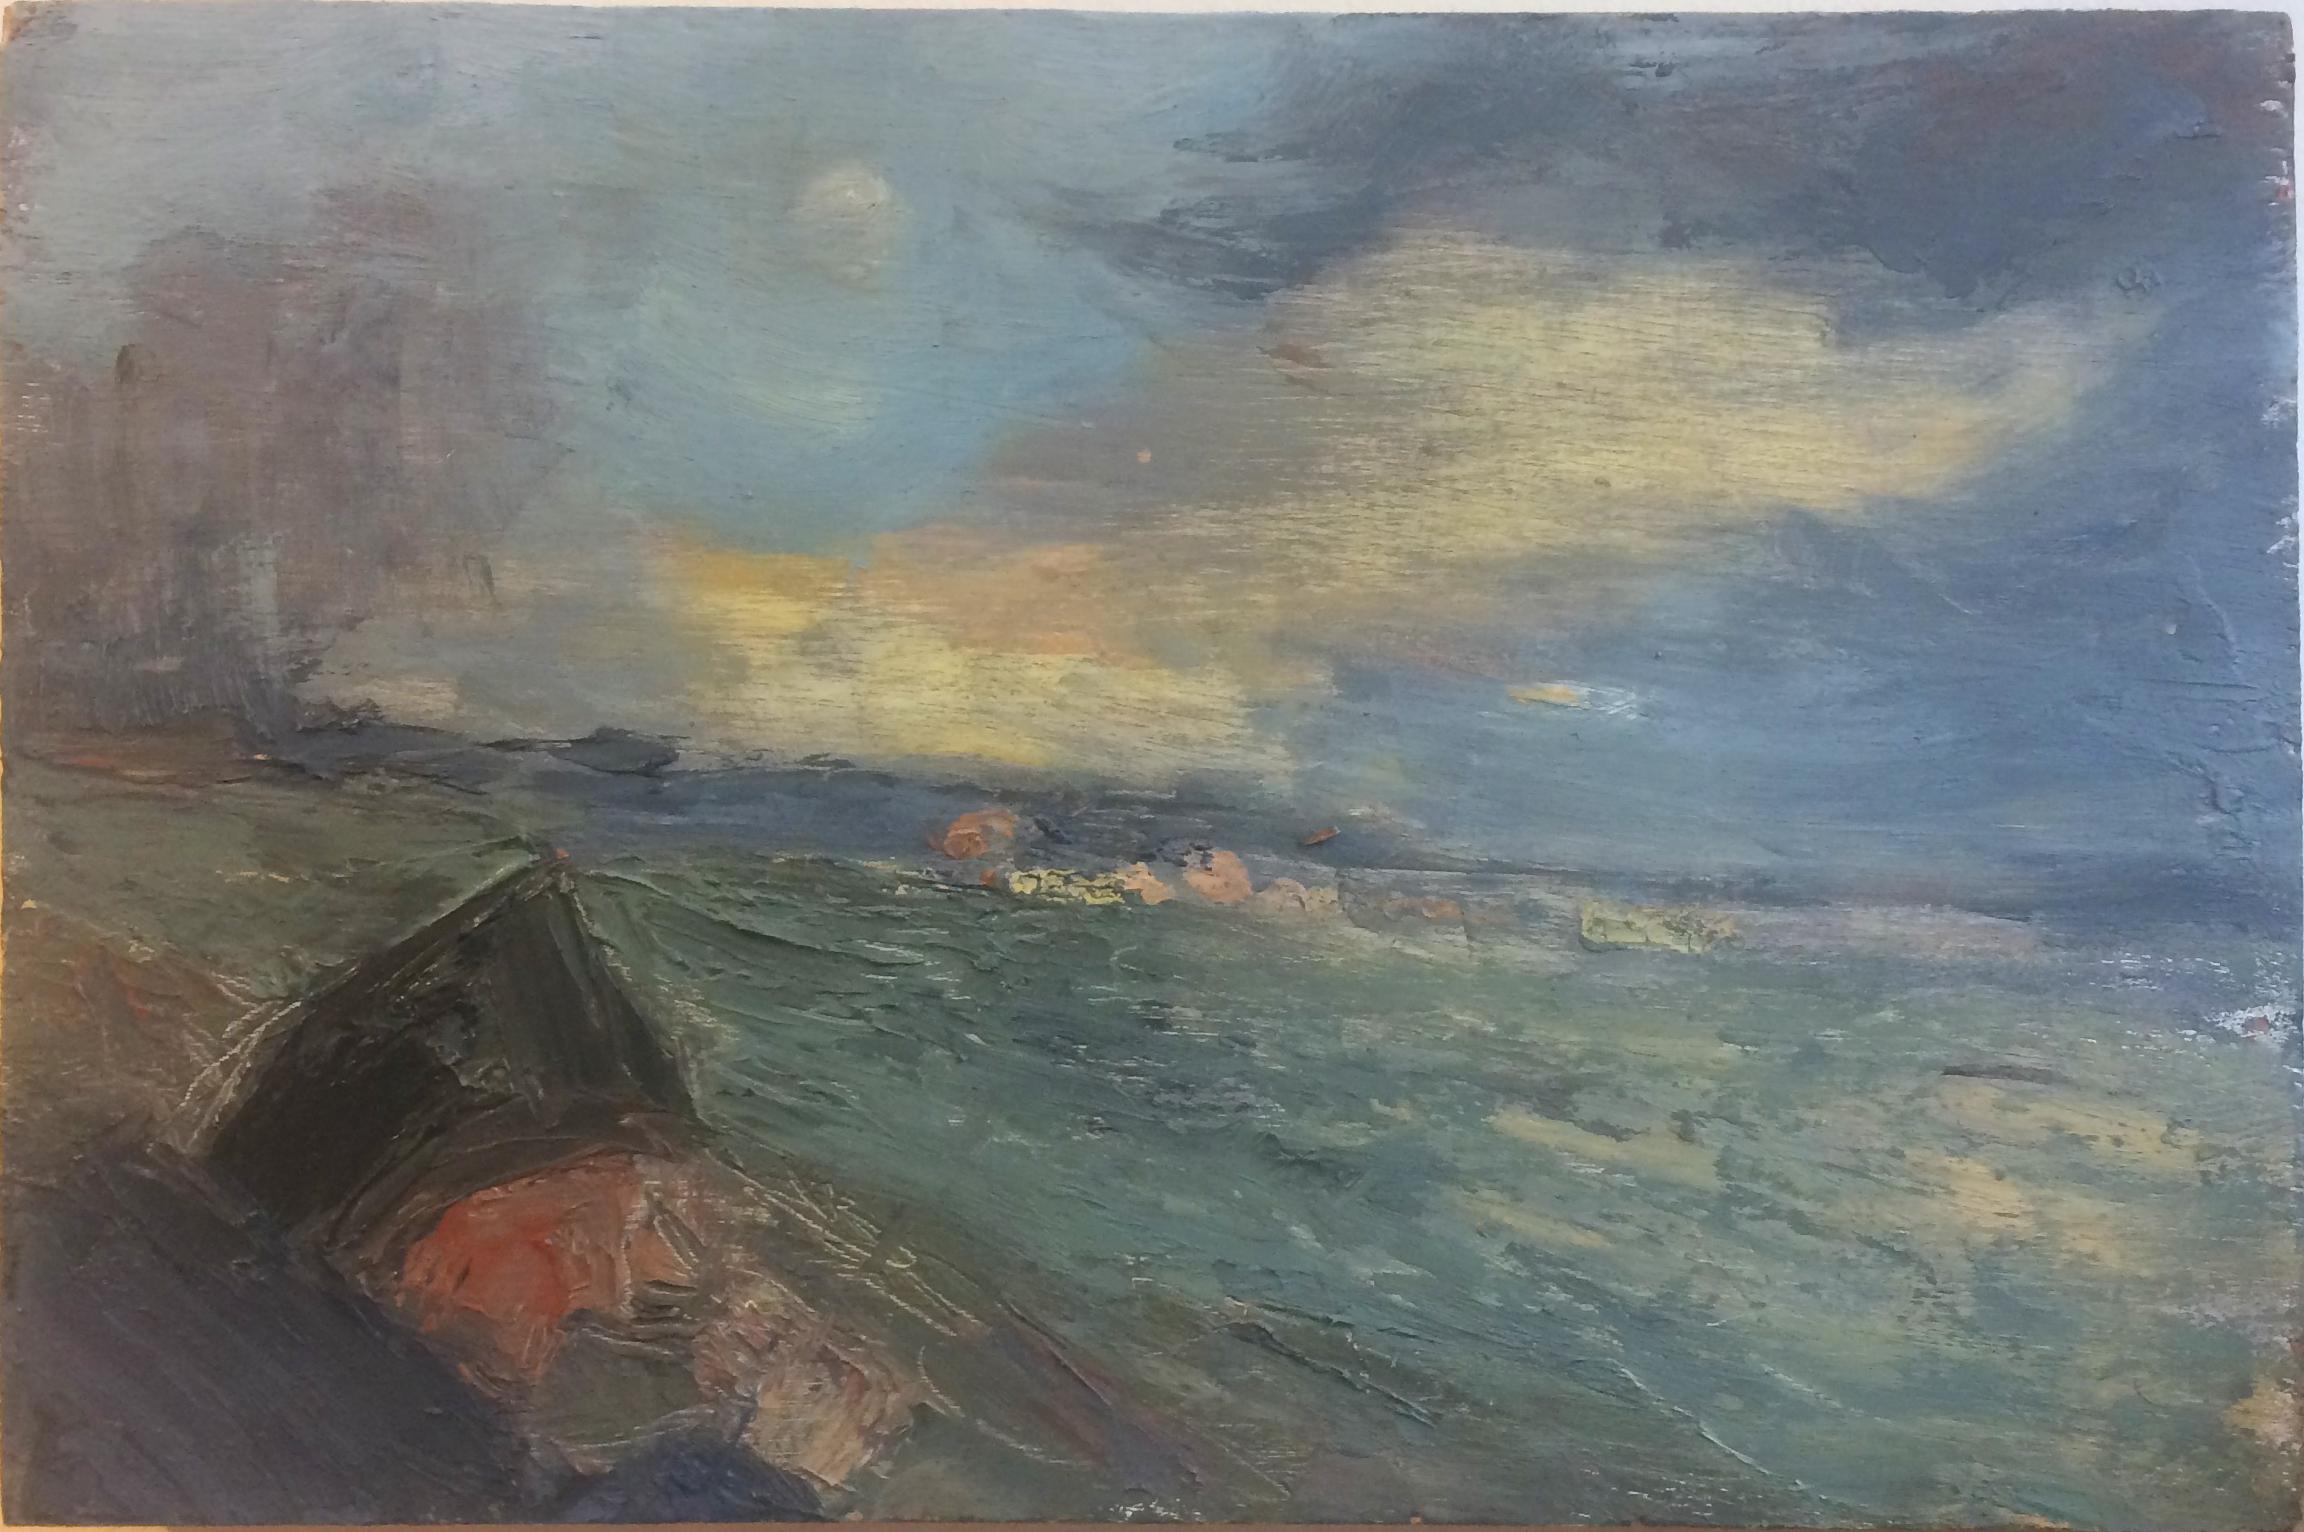 Searay blues, oil on panel, 2017